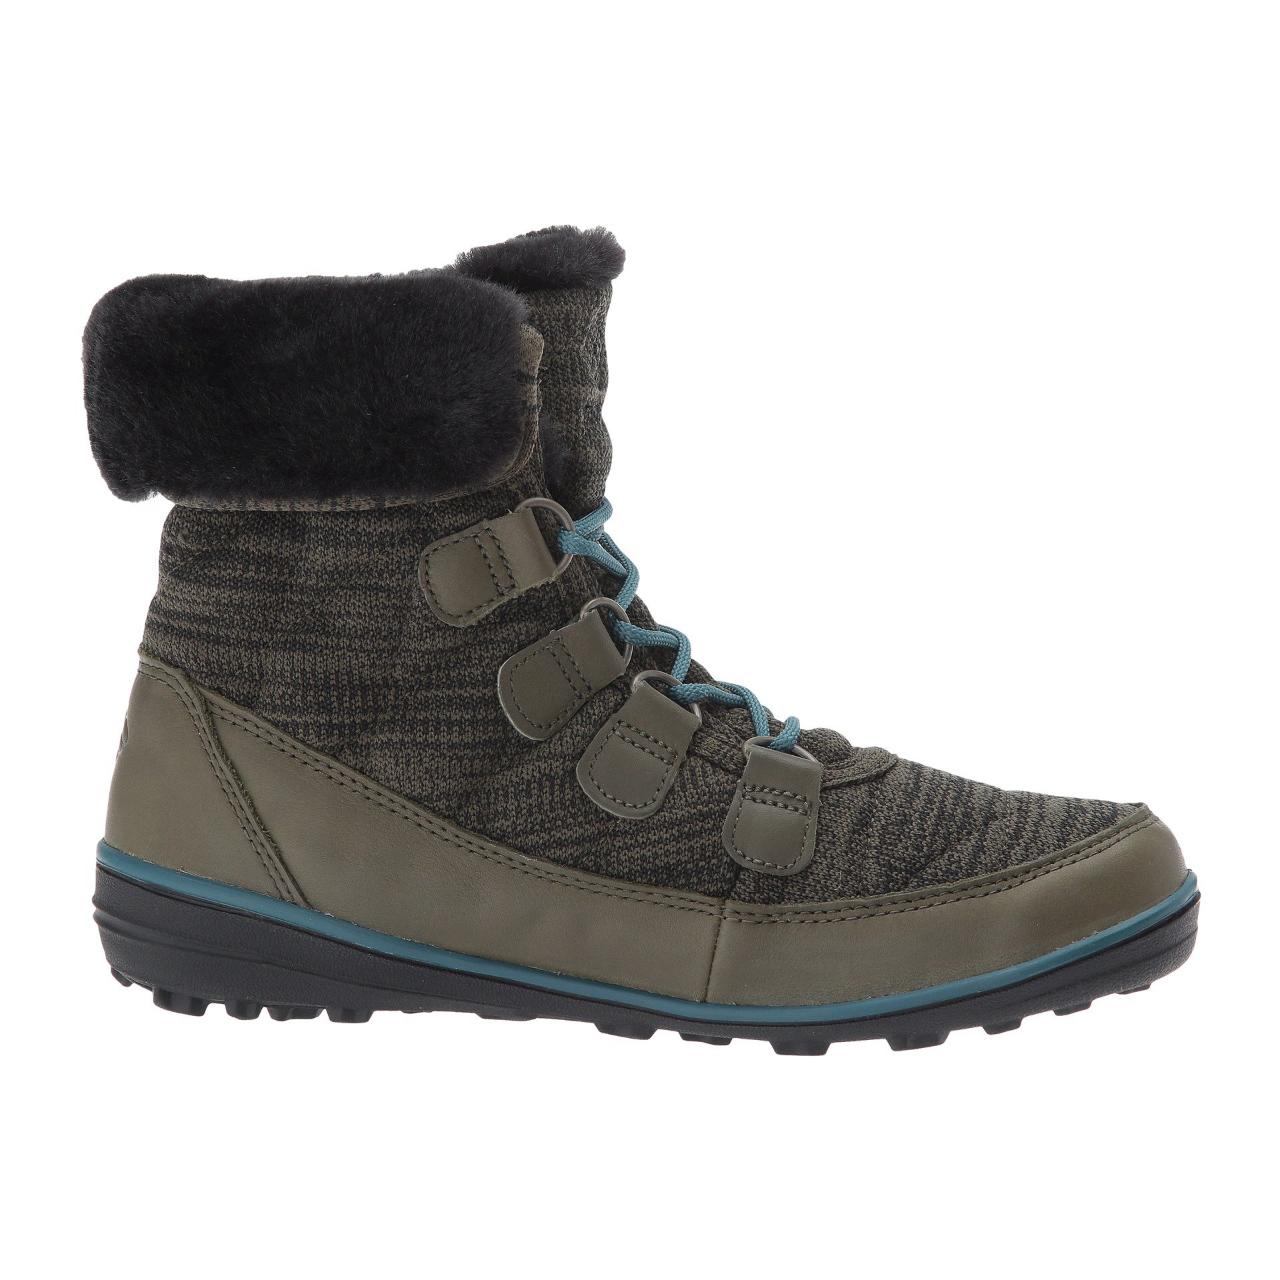 Columbia Heavenly Chimera 9 Shorty Omni Heat Winter Snow Boot Nori Damenschuhe 9 Chimera 50ae0f